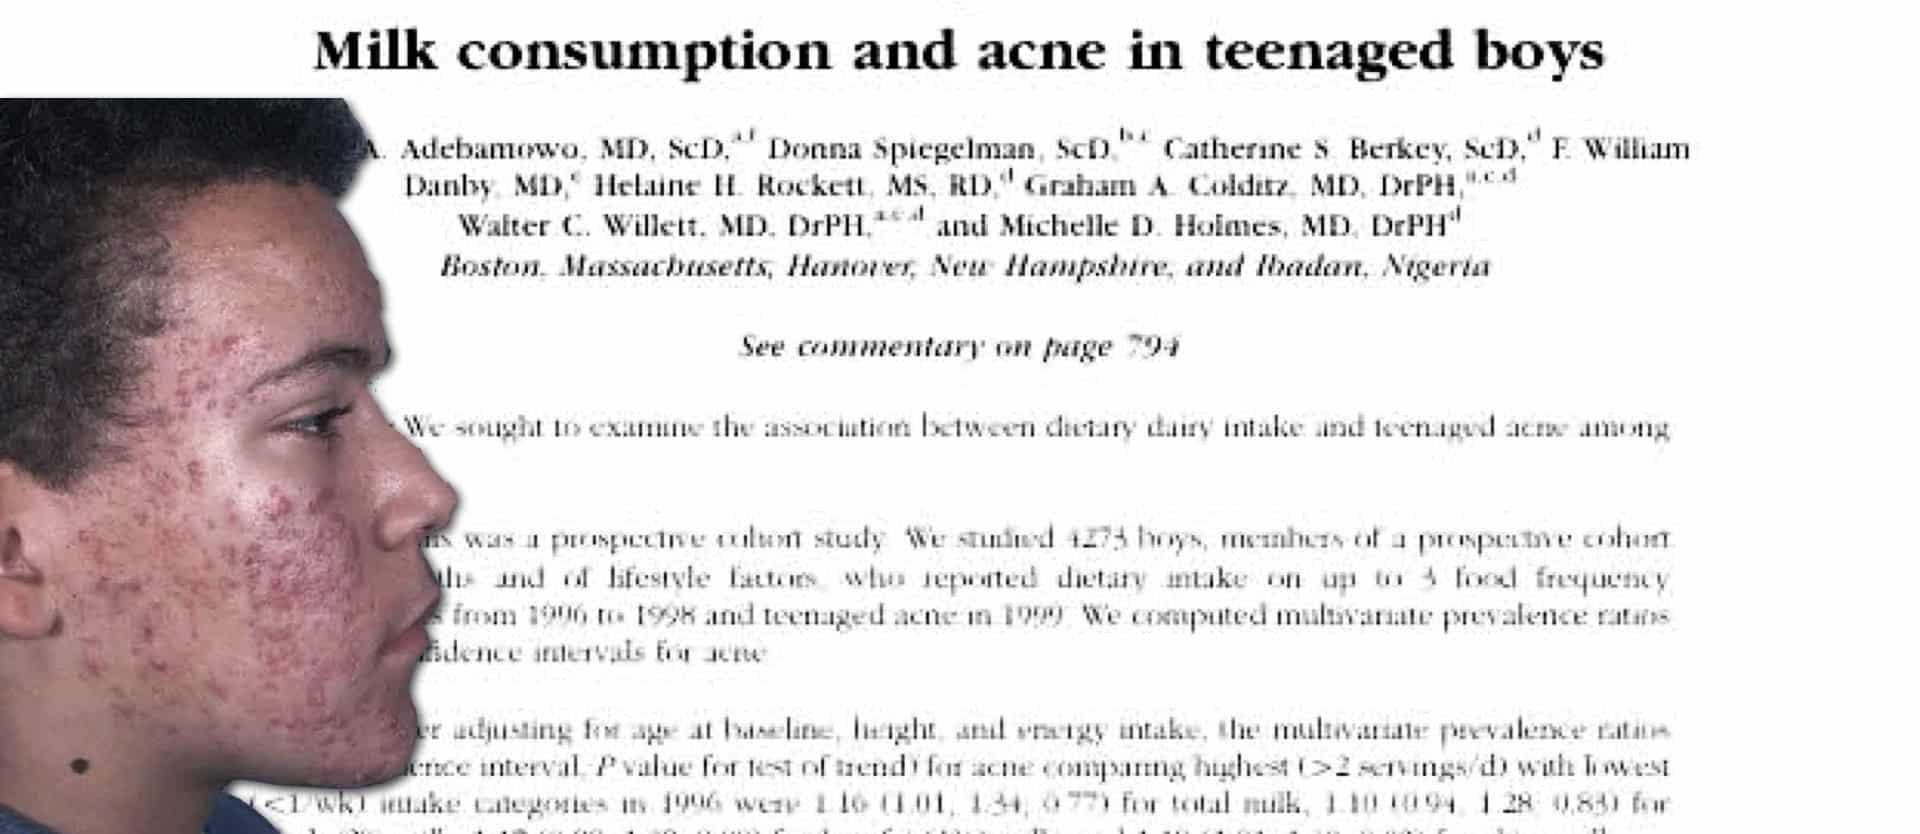 Dairy & Acne